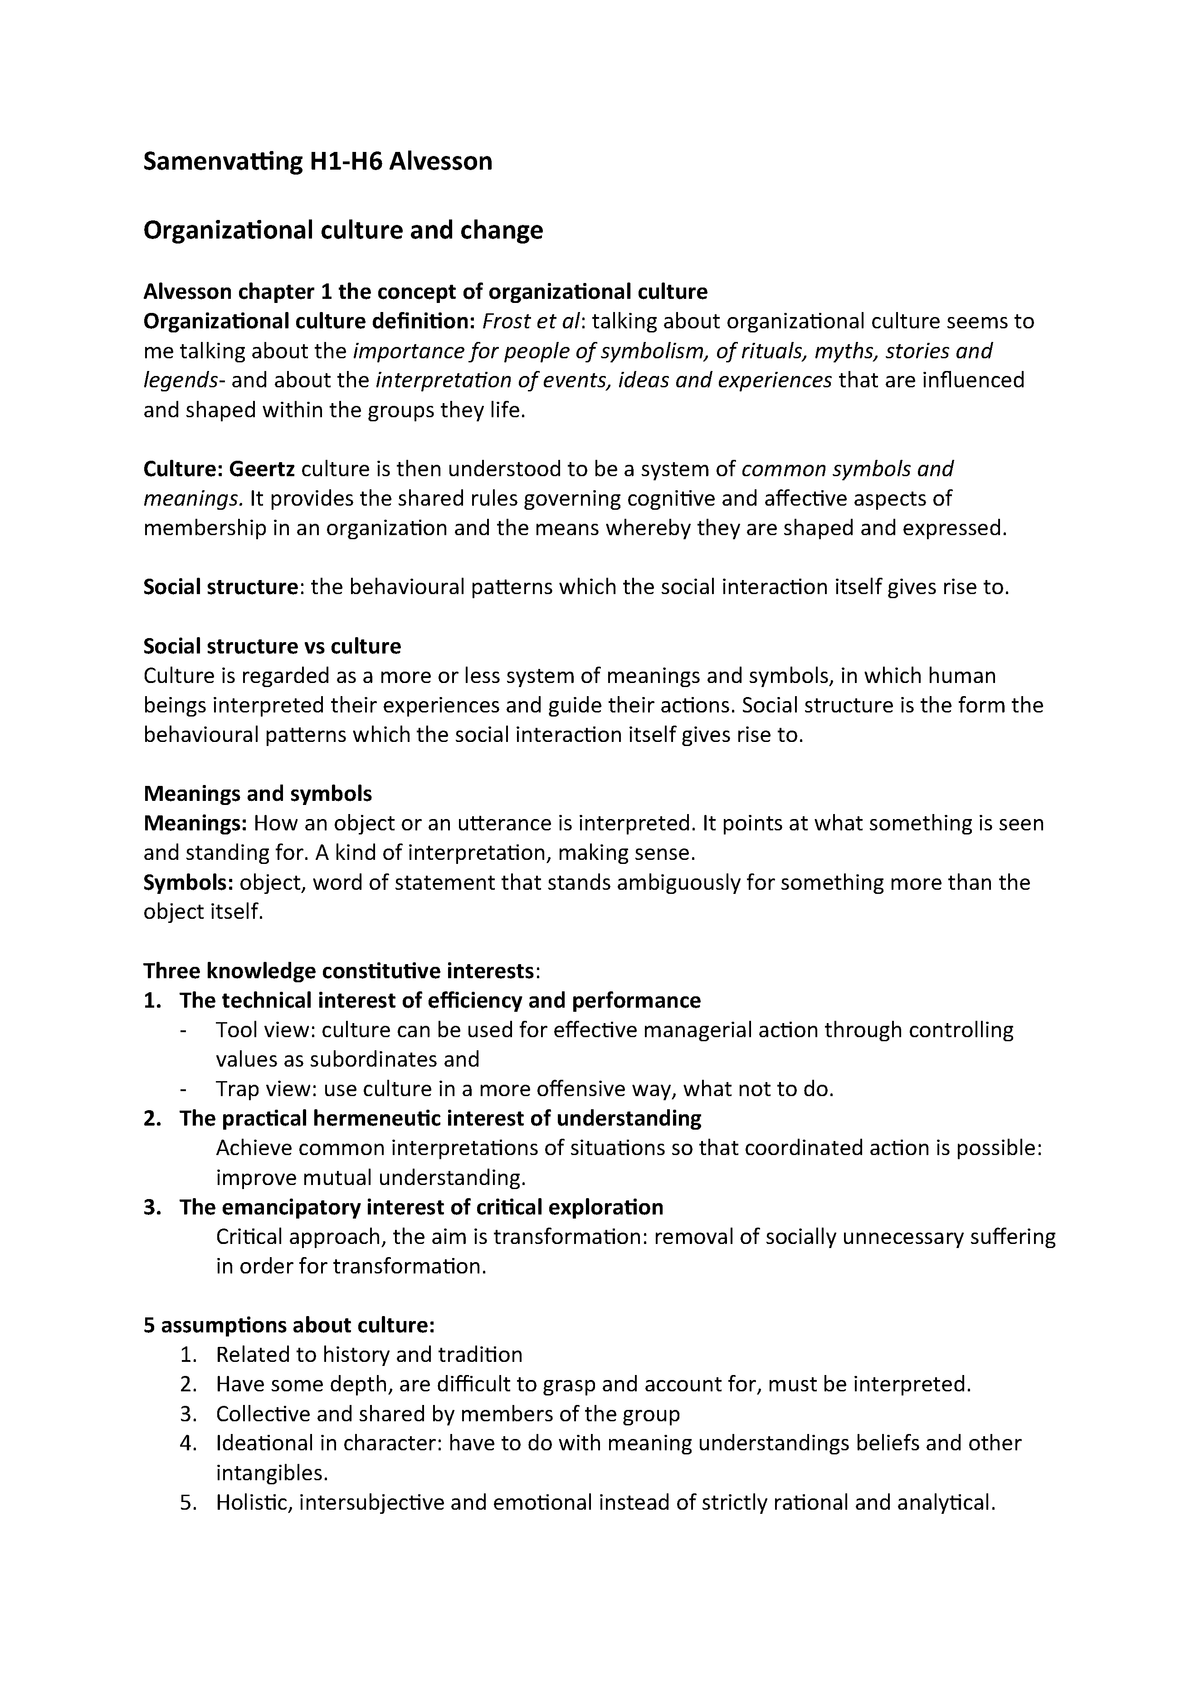 Samenvatting Alvesson - S_OCC - VU - StudeerSnel